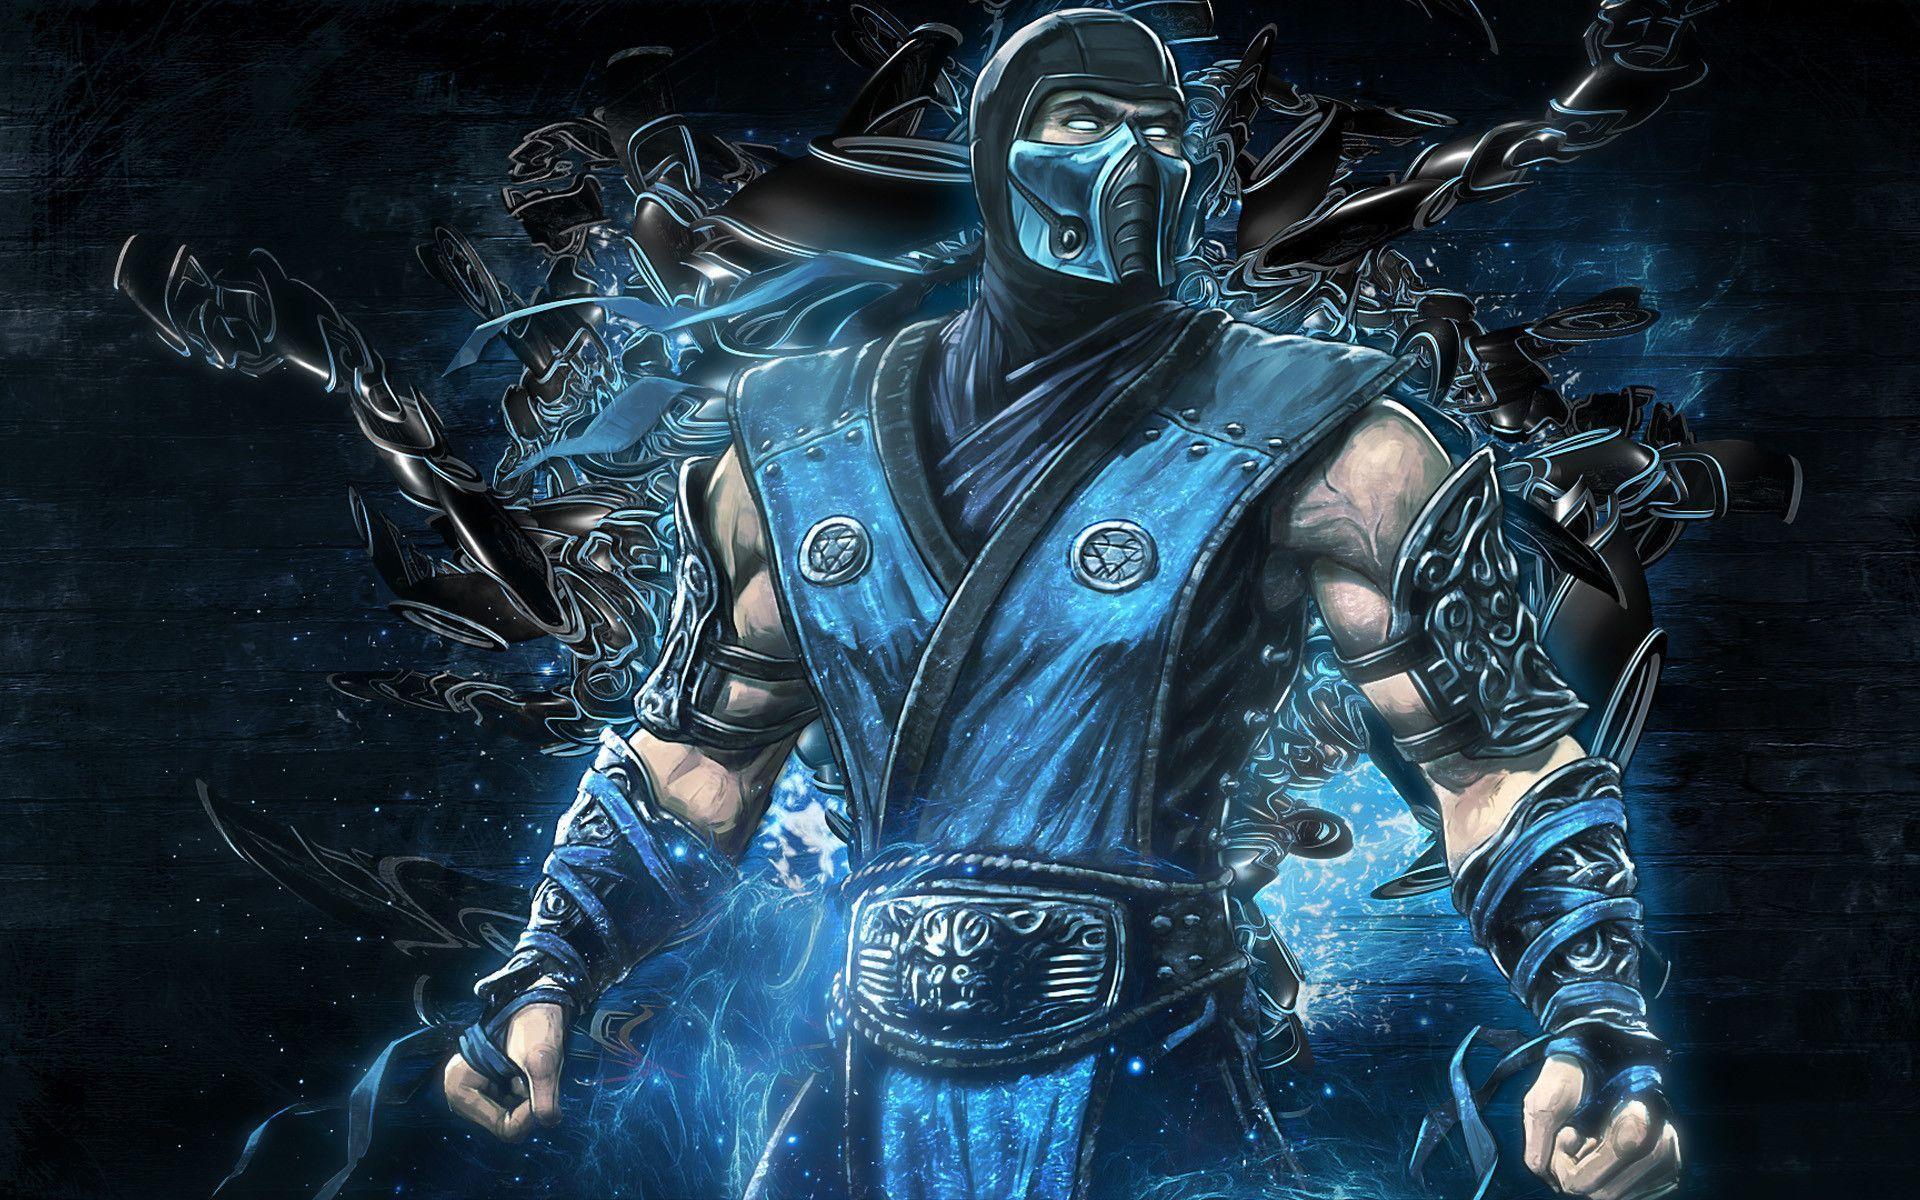 Hd wallpaper cave - Mortal Kombat Wallpapers Full Hd Wallpaper Search Wallpaper Cave 01 17